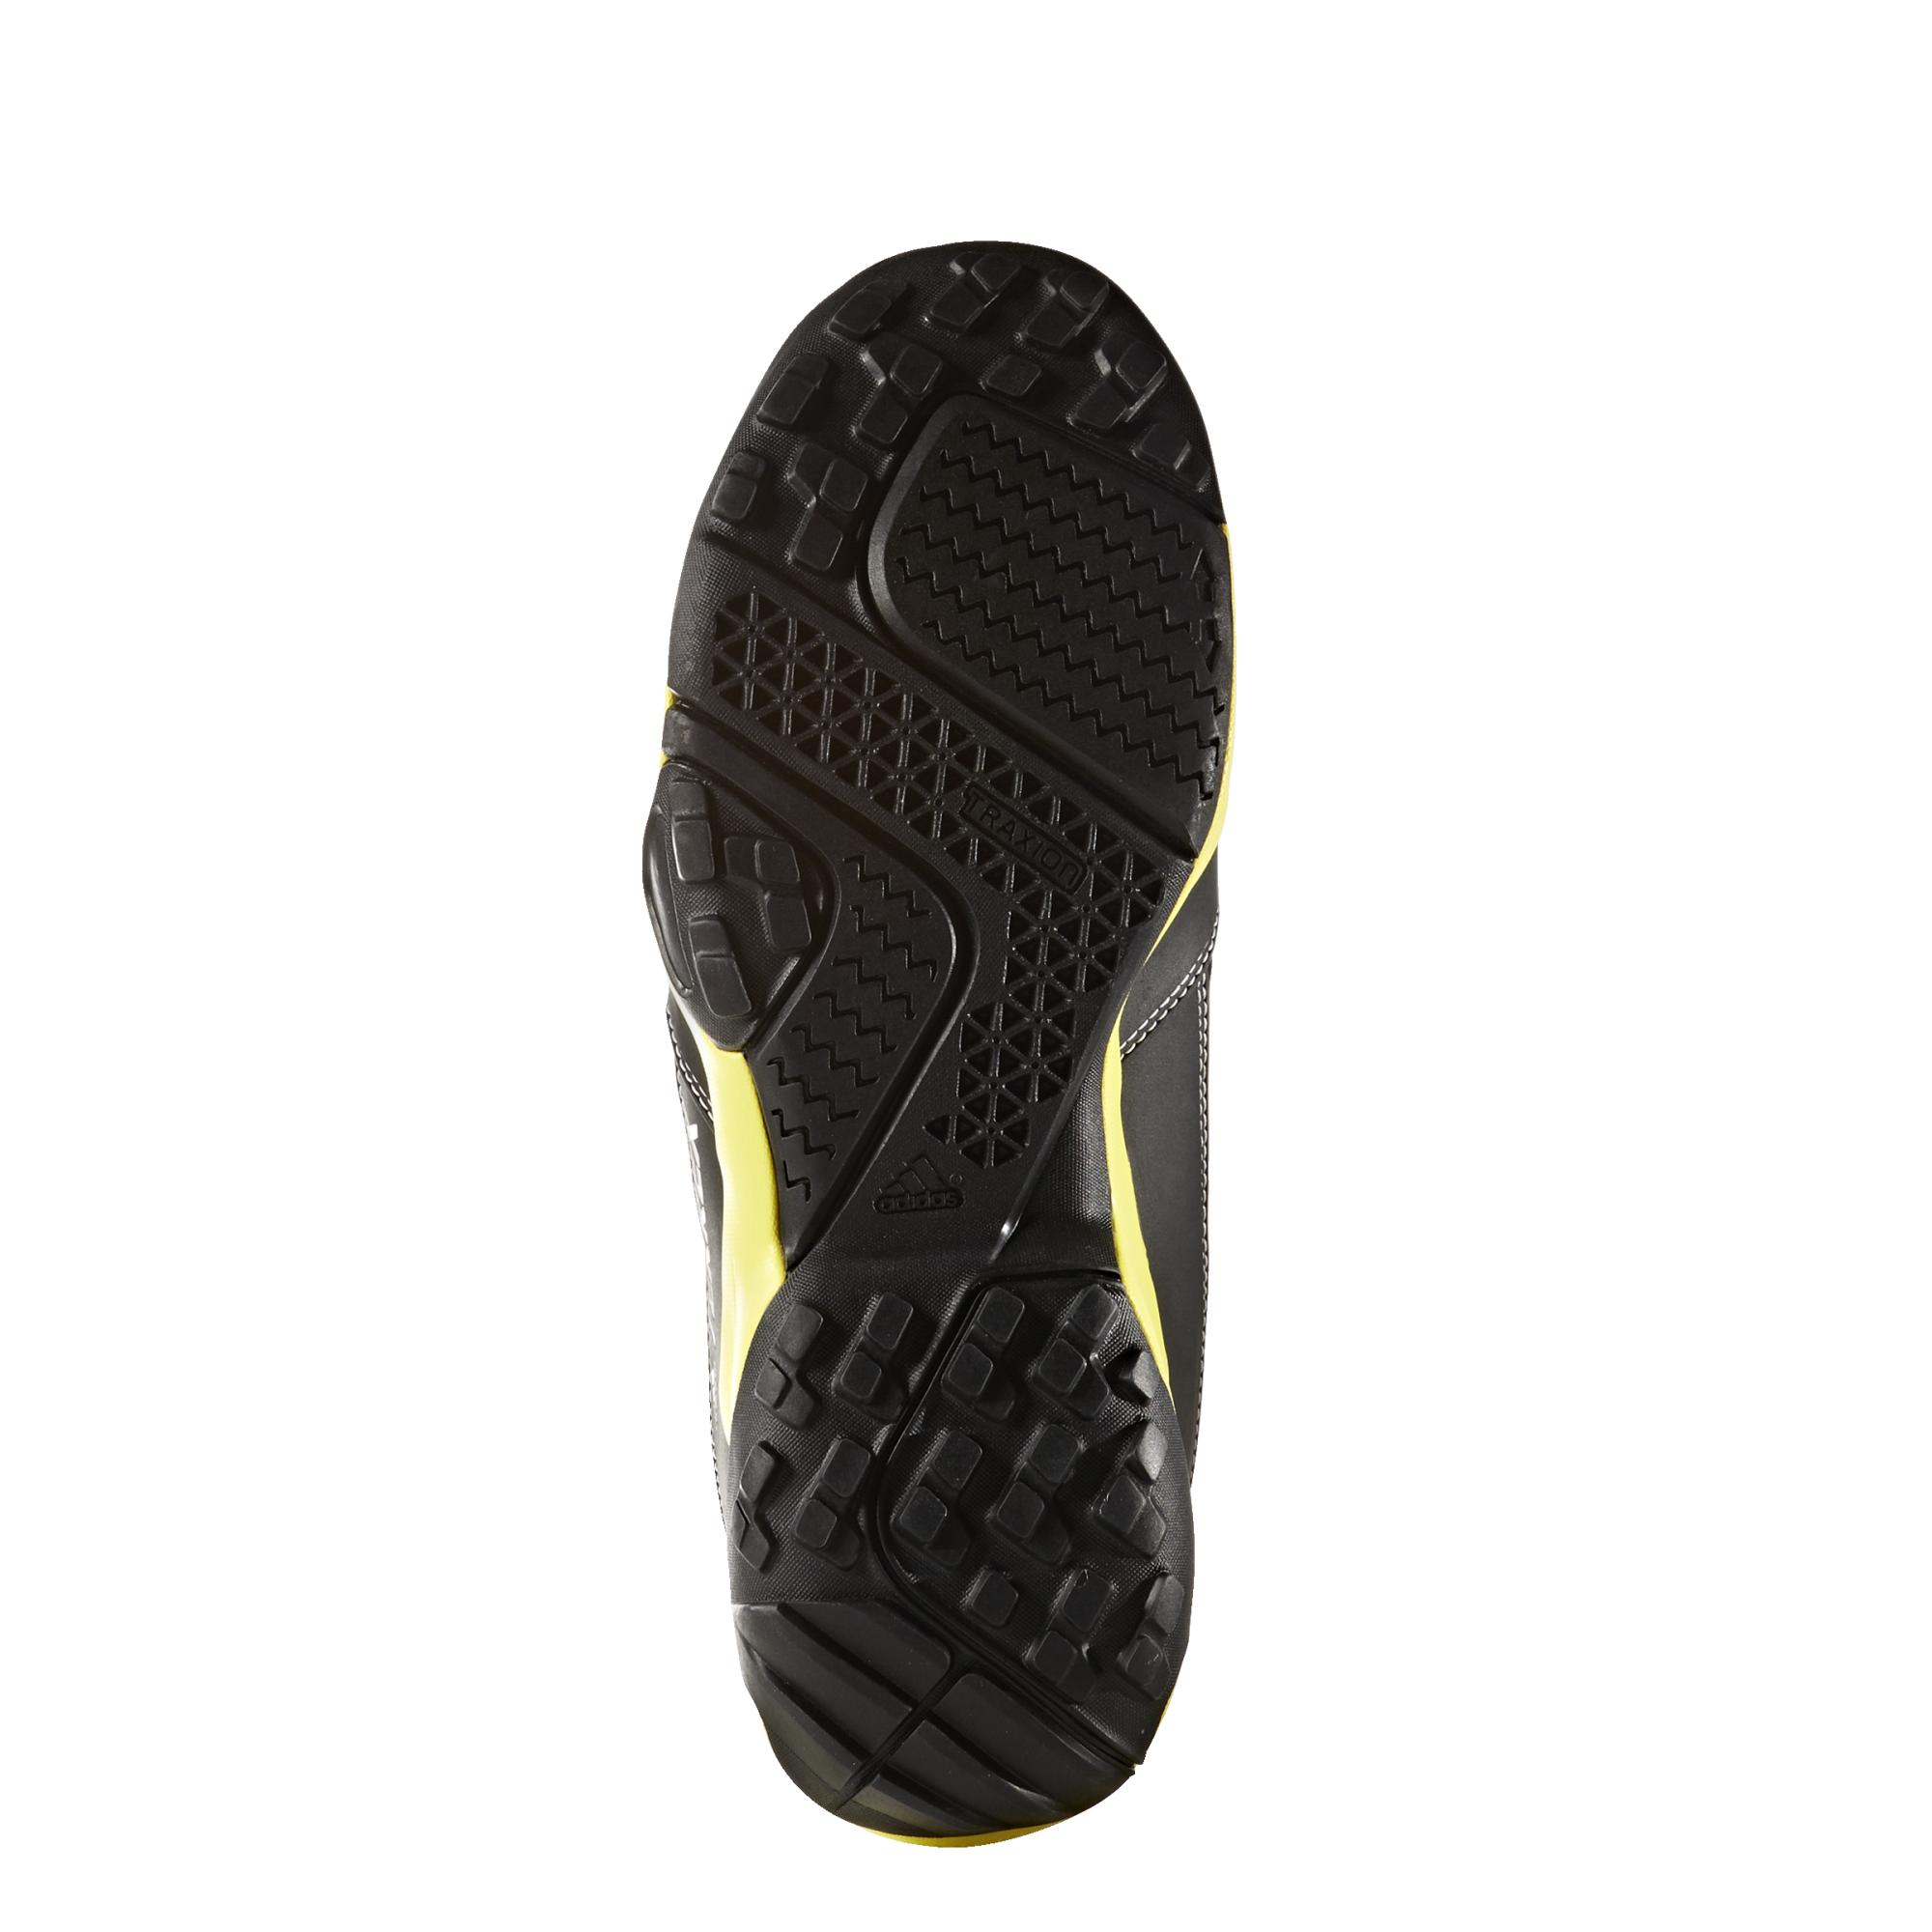 Canyoningschuh Adidas Hydro Lace 2017